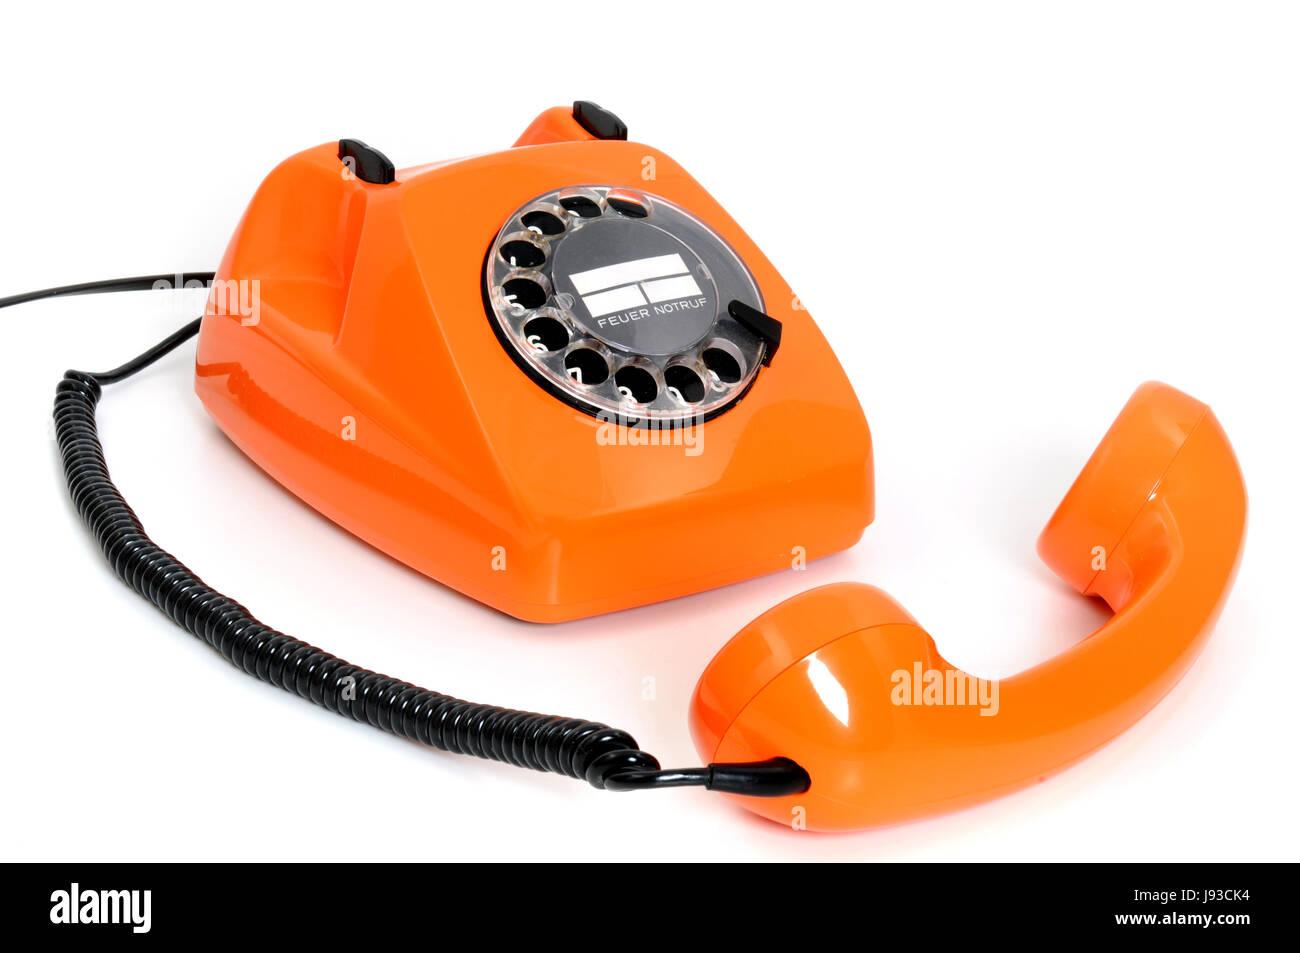 telephone, phone, listener, slim down, lose weight, orange, waned, old, - Stock Image